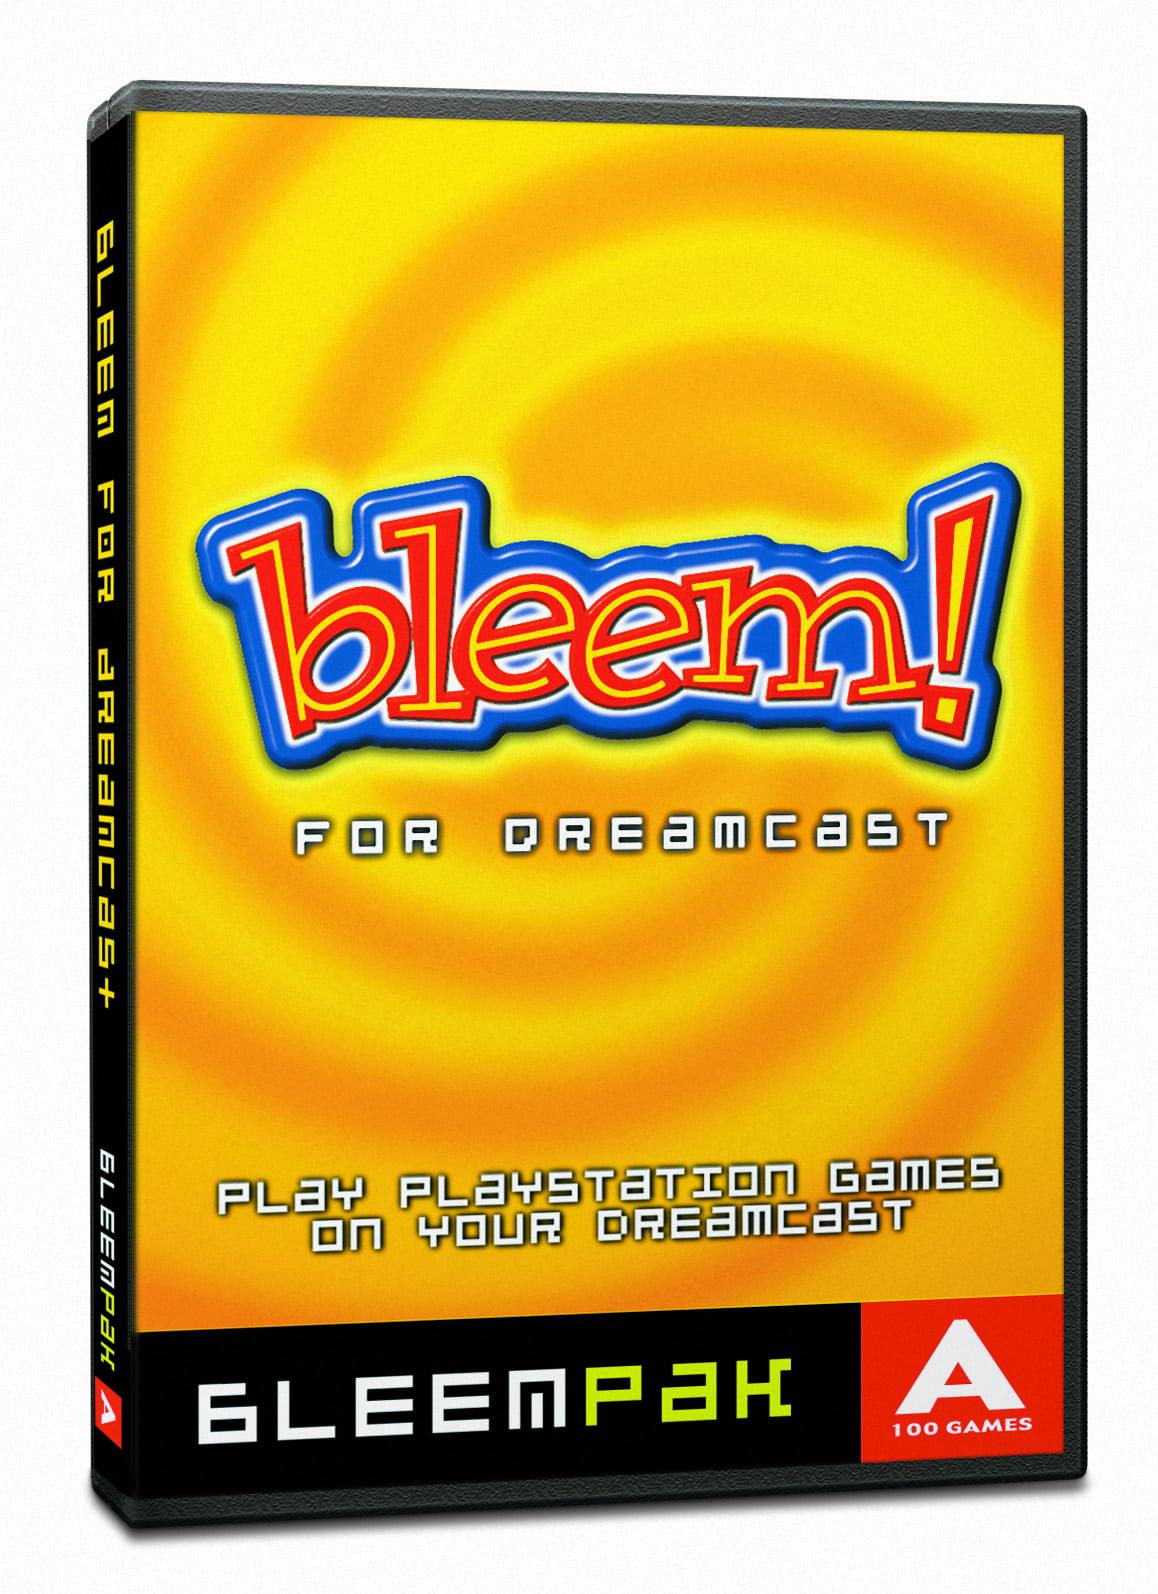 bleemcast - Emulator bleem! / bleemcast! - czyli walka Dawida z Goliatem